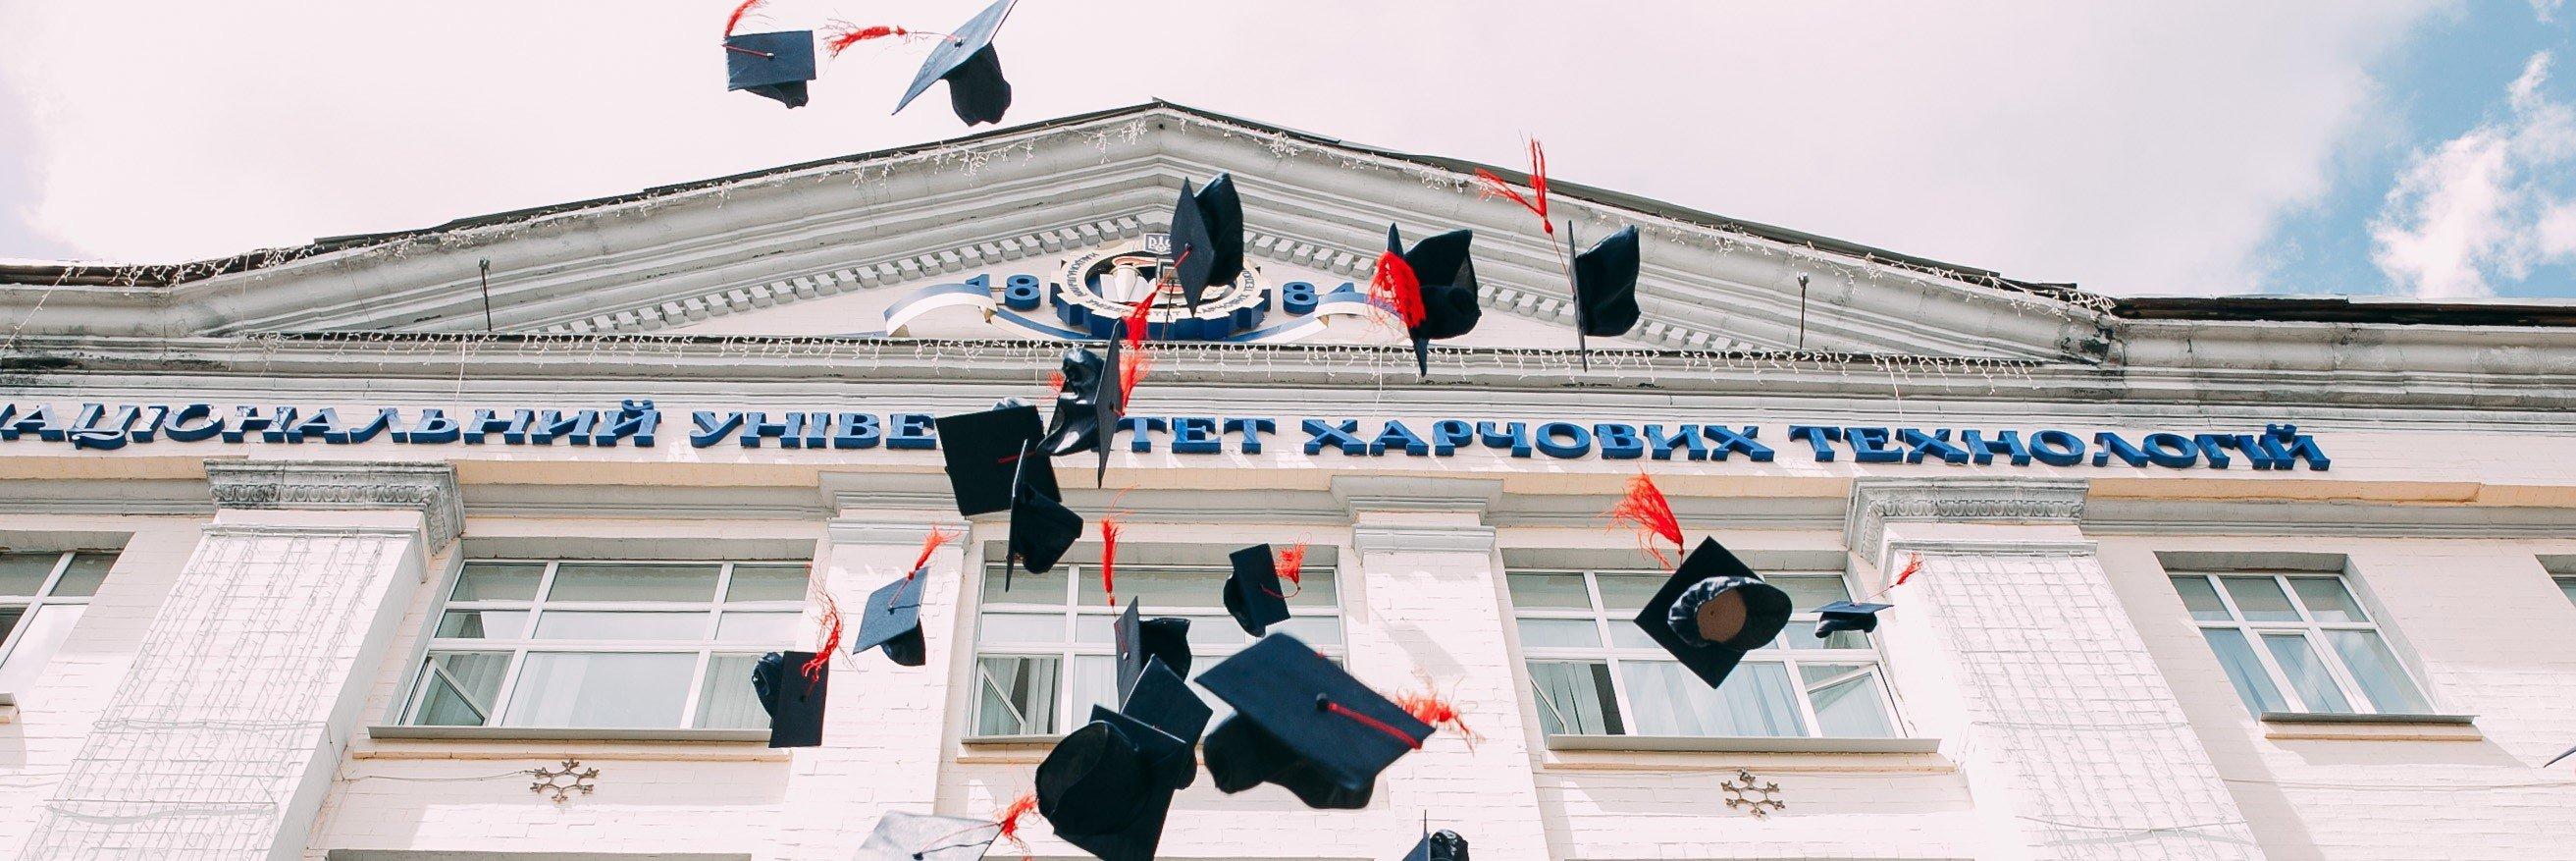 graduates throwing caps banner - vasily-koloda-620886-unsplash